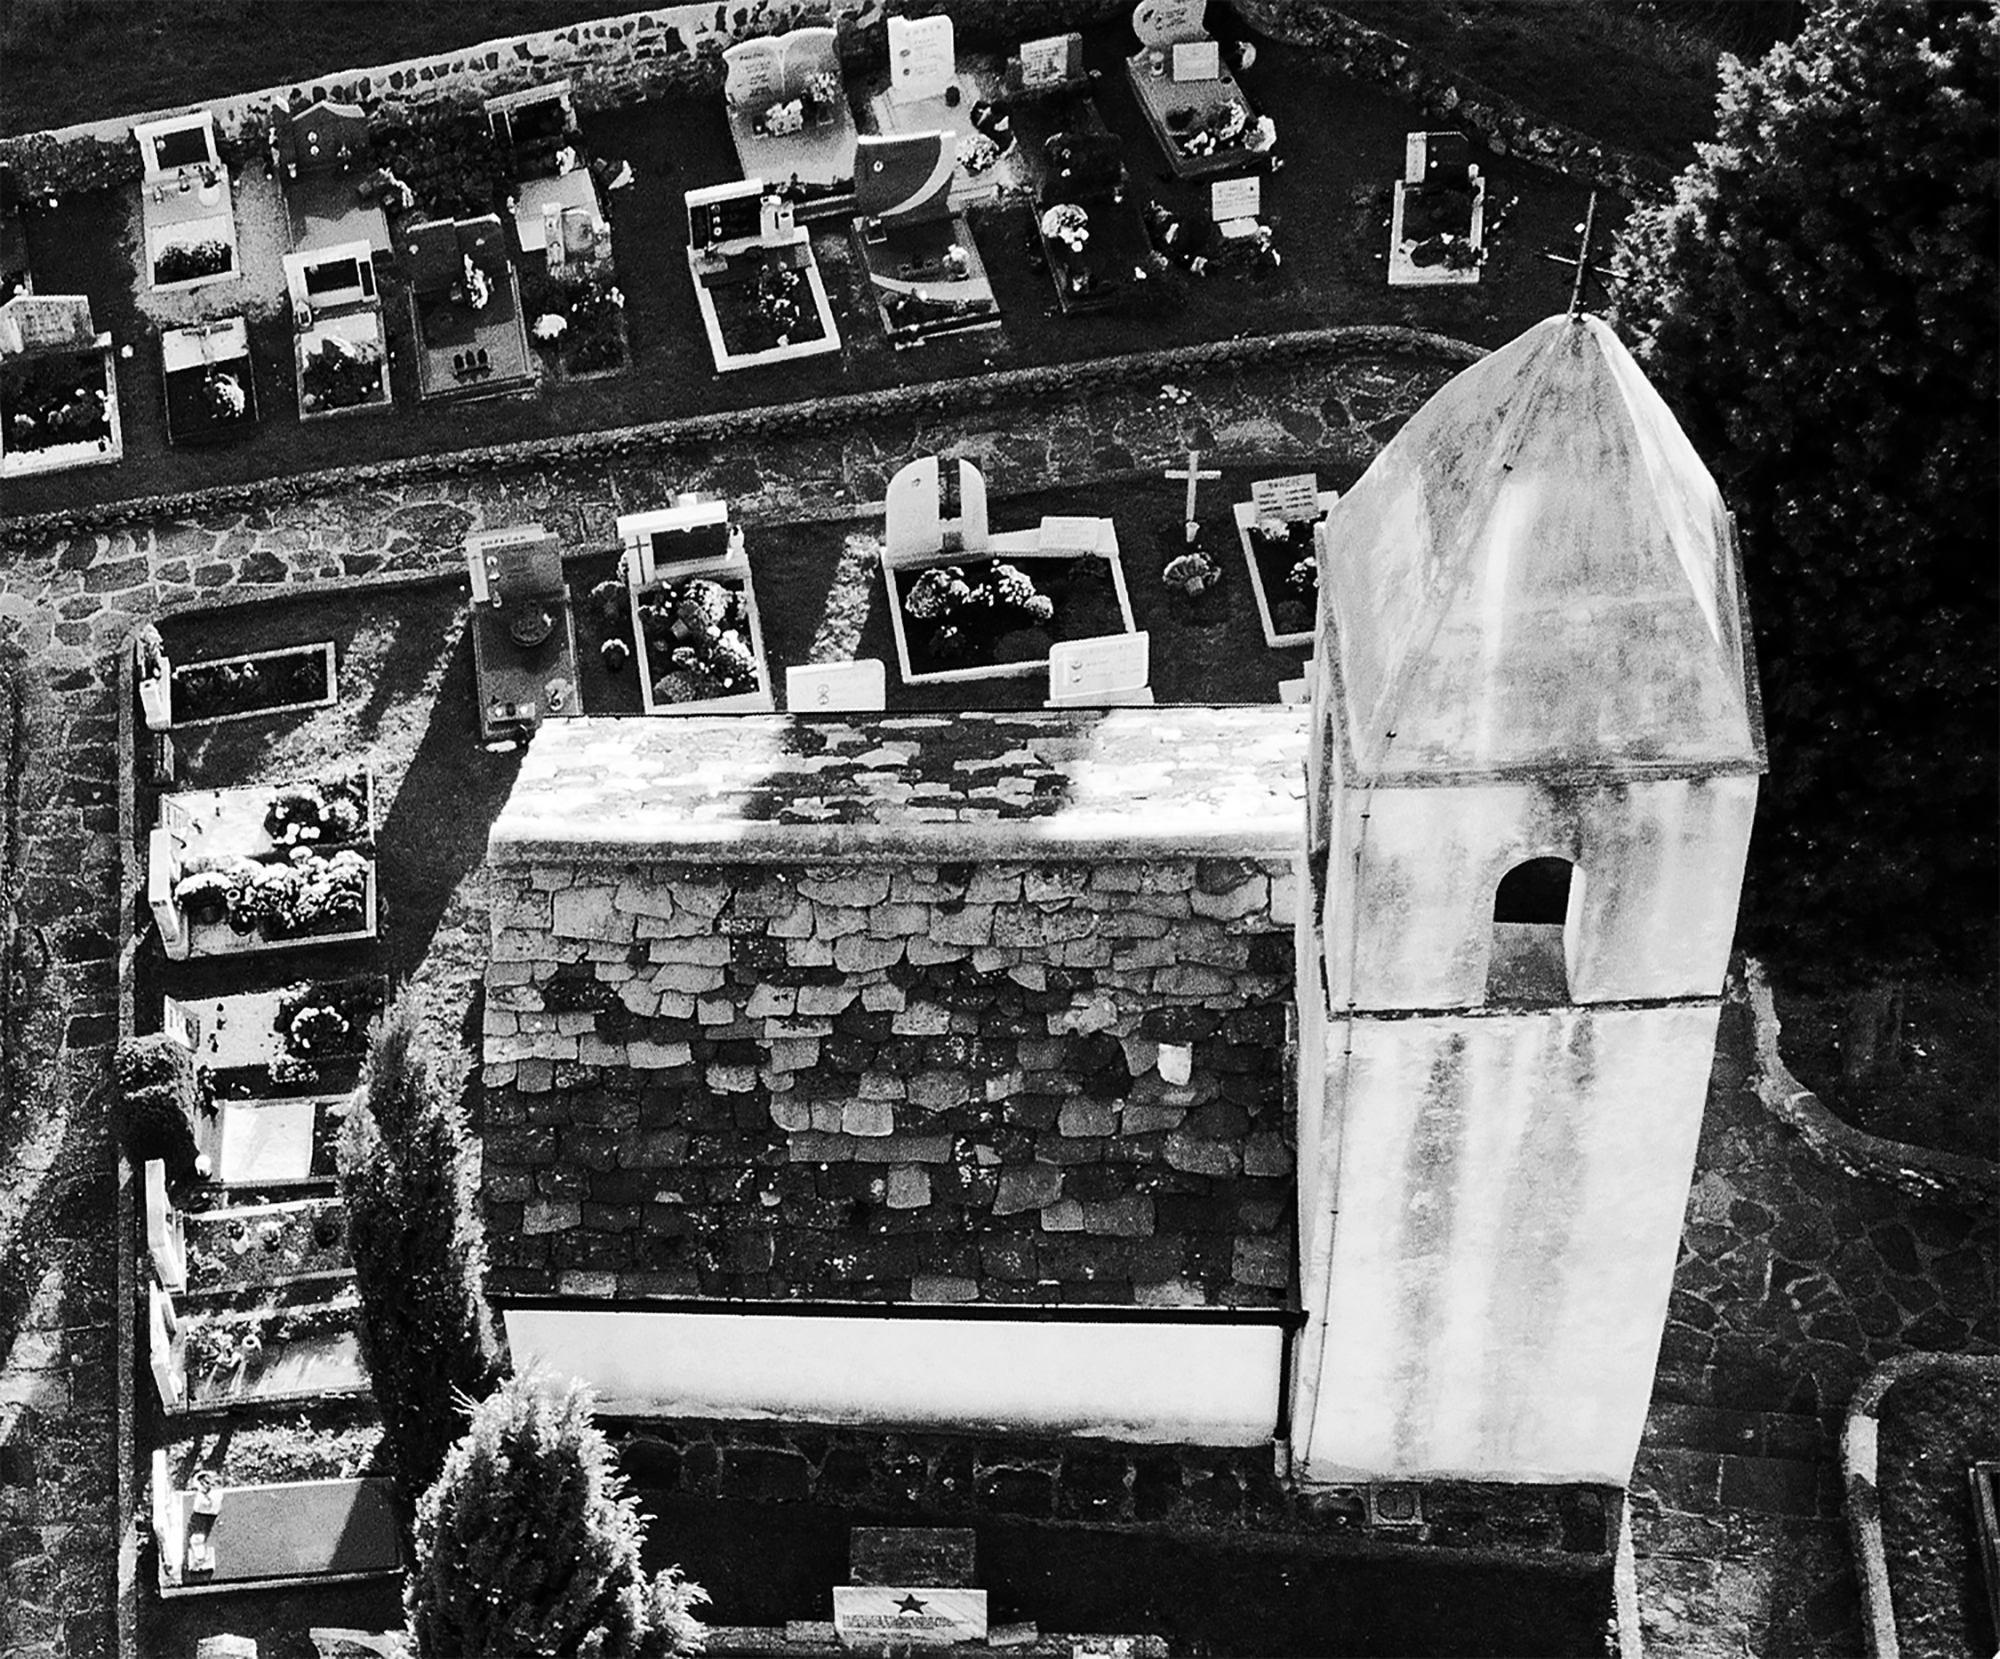 Kite Aerial Photographers Ljubl - kap_jasa | ello